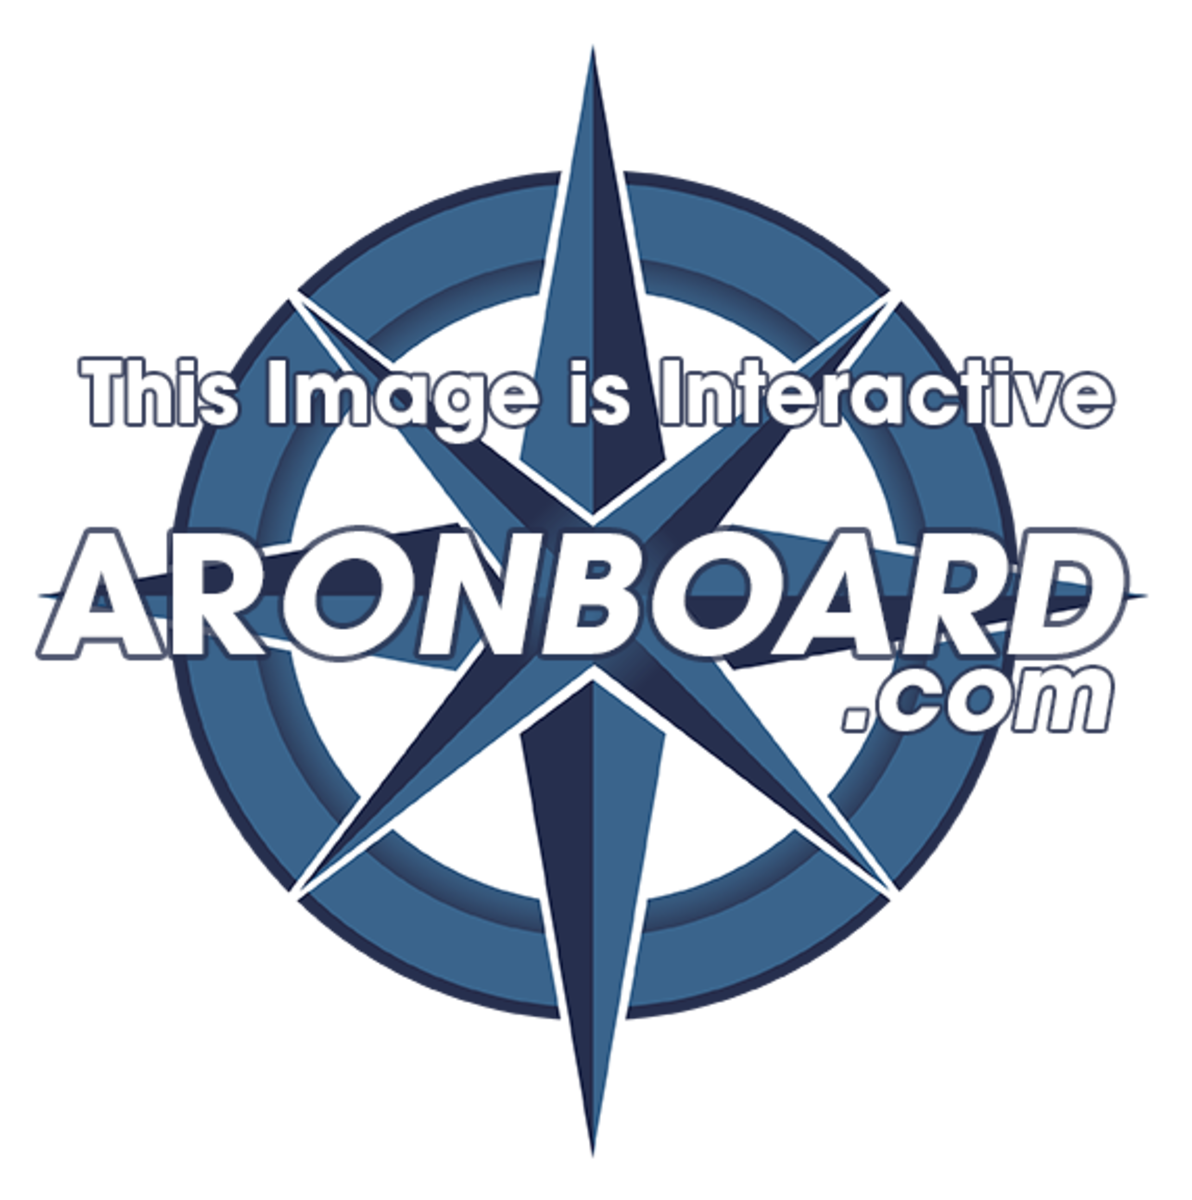 ar onboard icon2-576x576